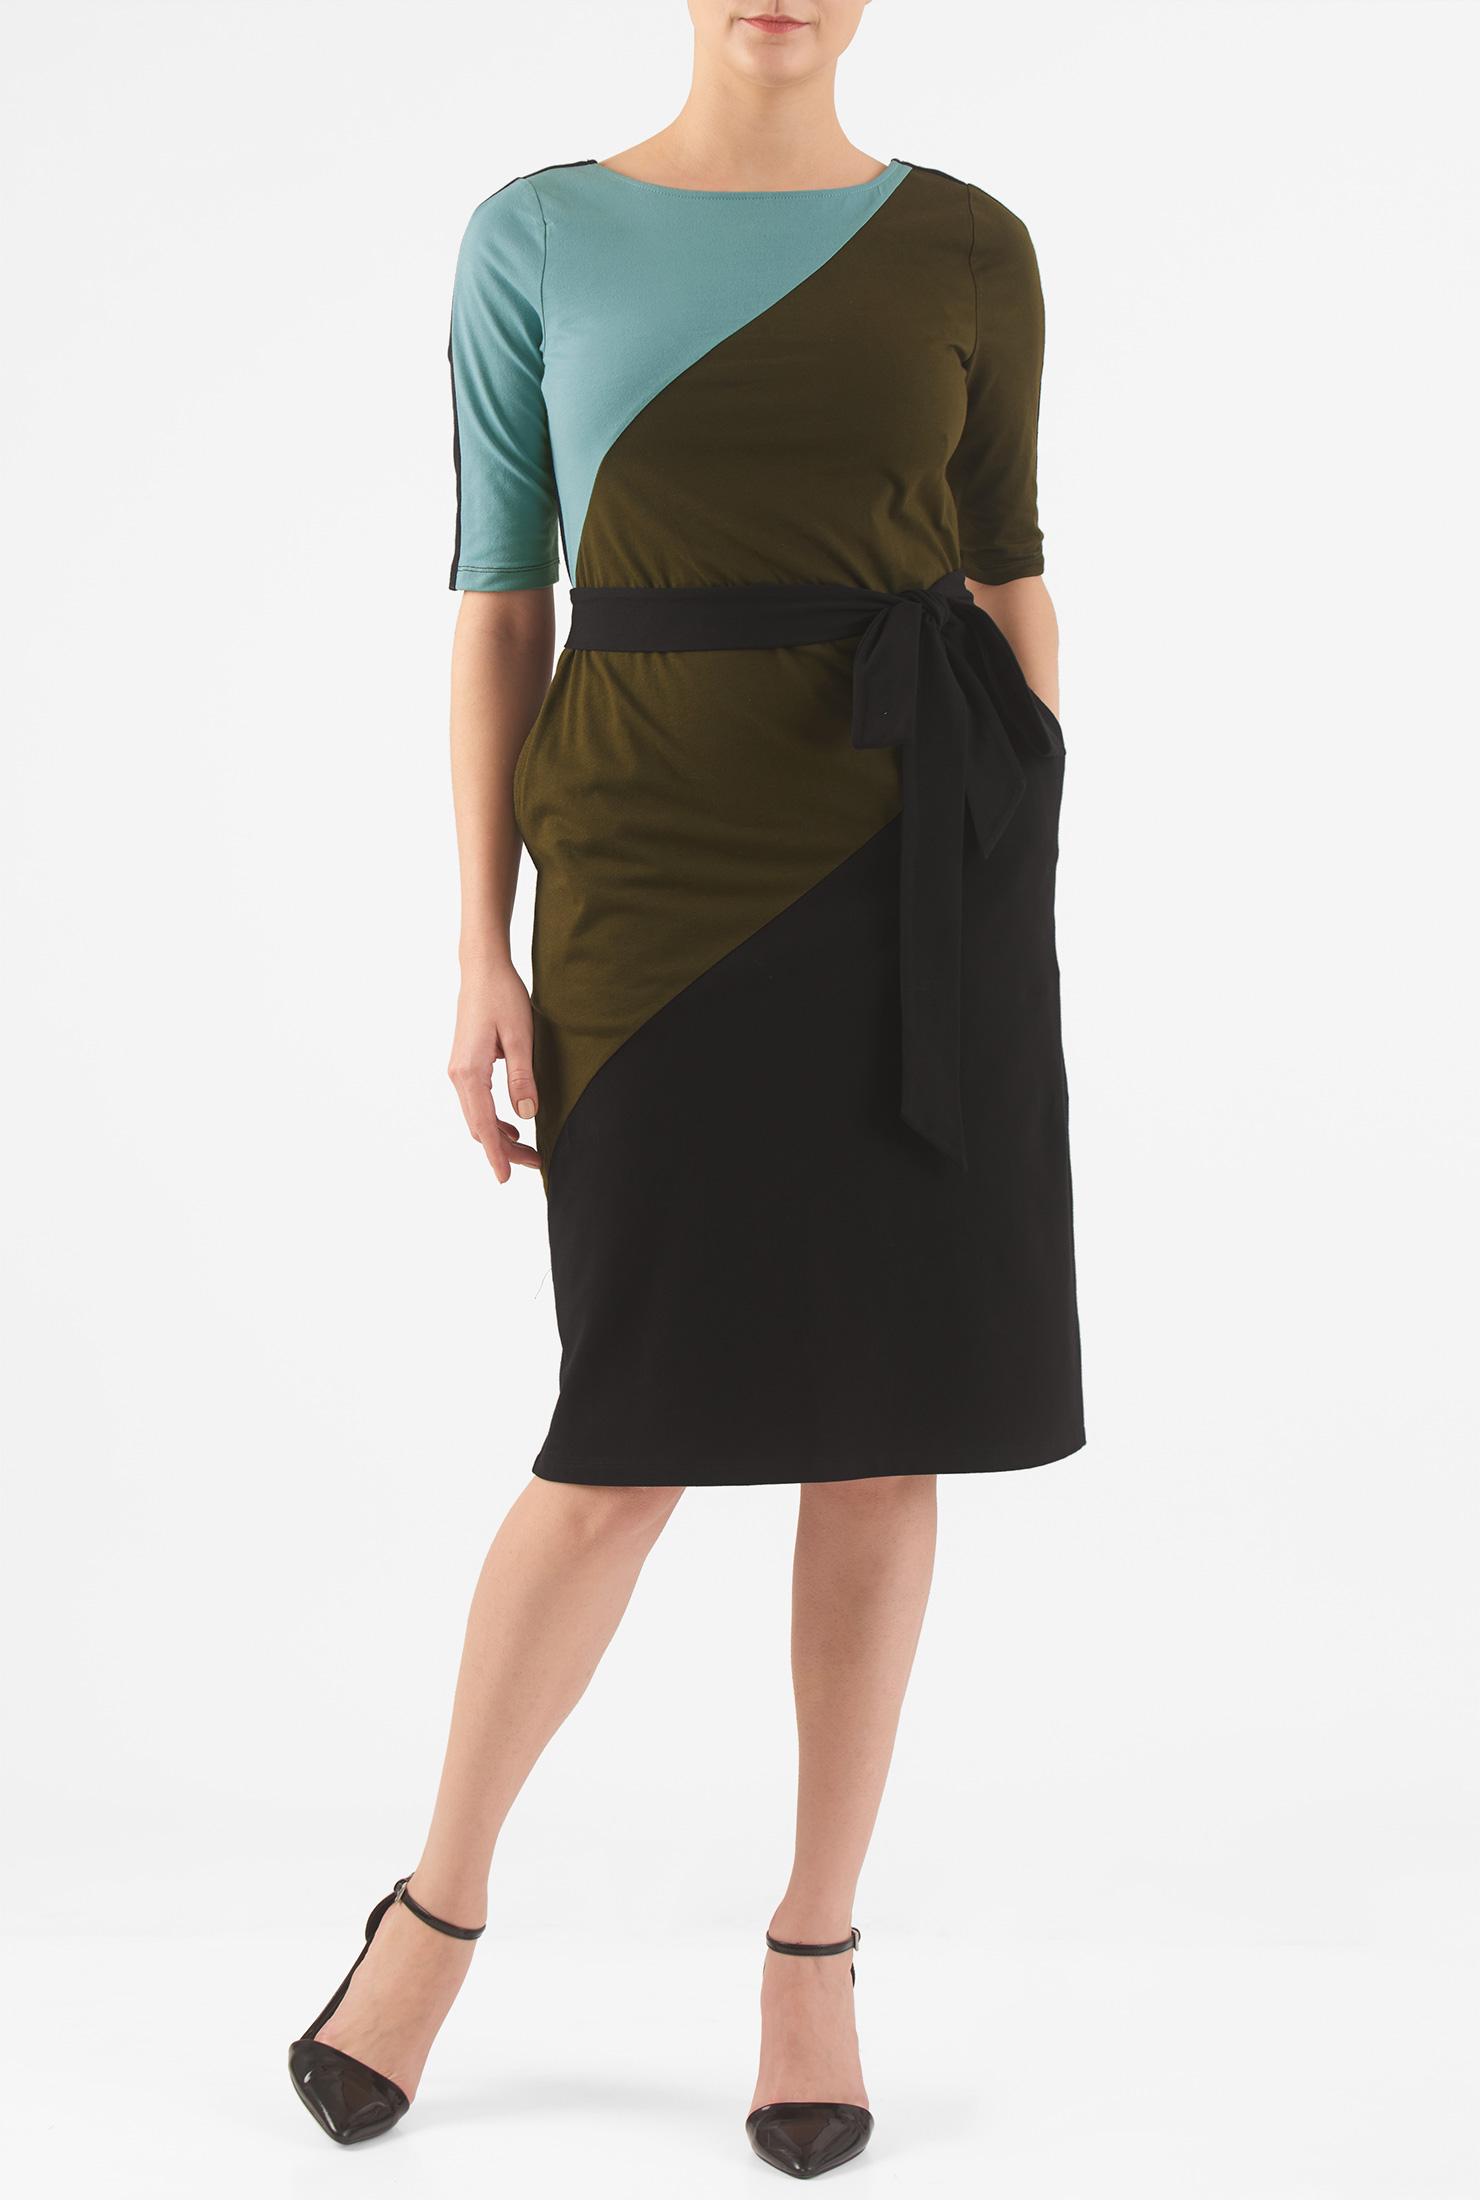 Eshakti Womens Sash Tie Colorblock Cotton Knit Shift Dress